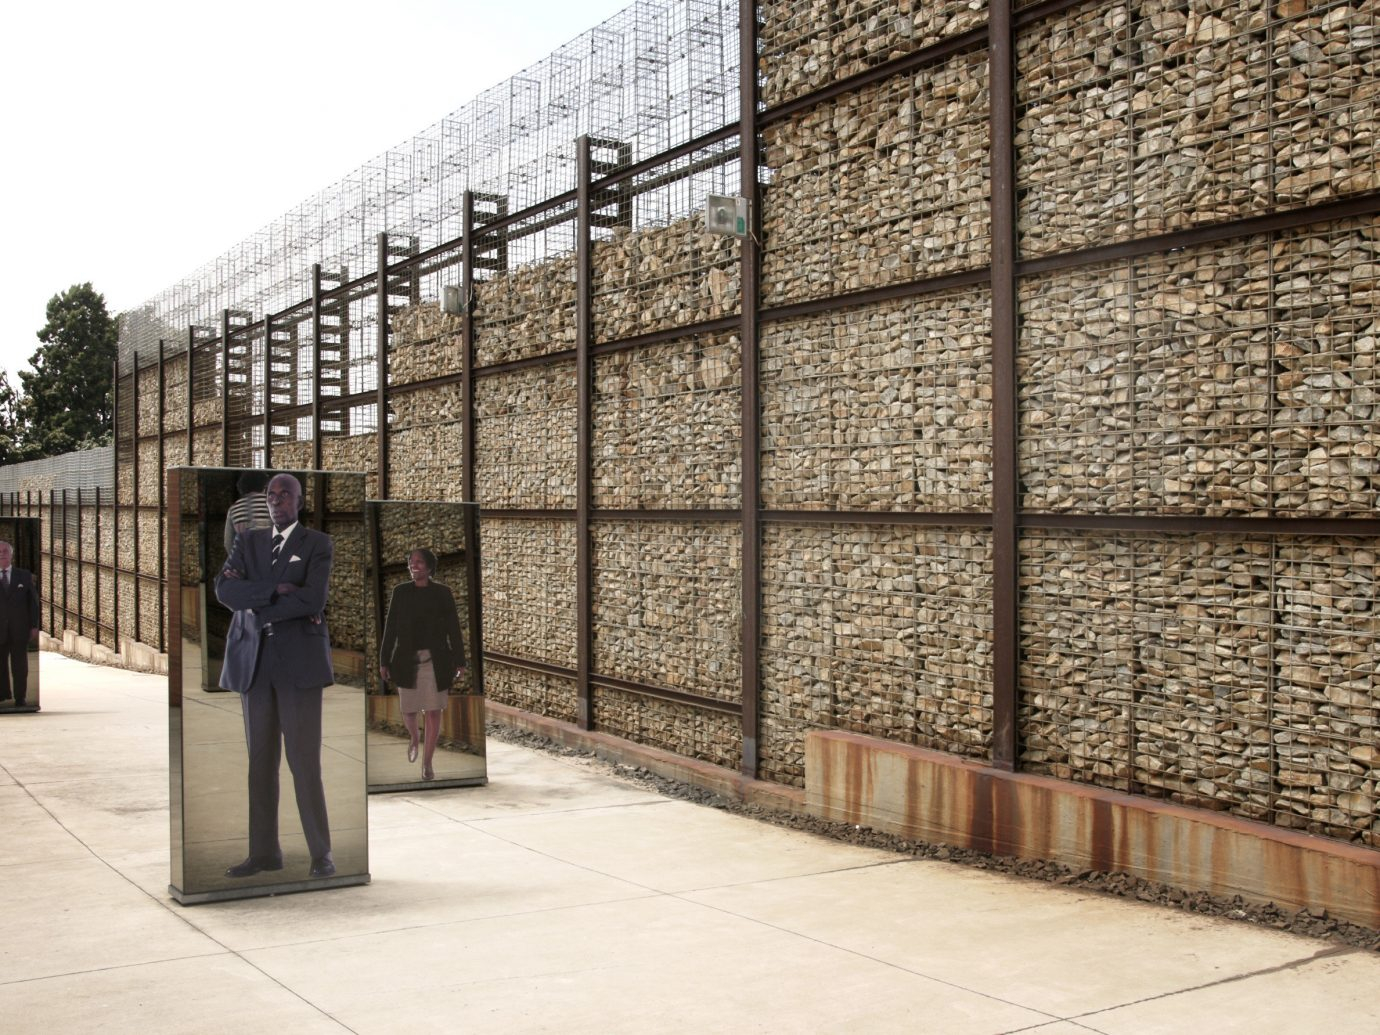 City Johannesburg South Africa Trip Ideas outdoor wall sidewalk facade walkway